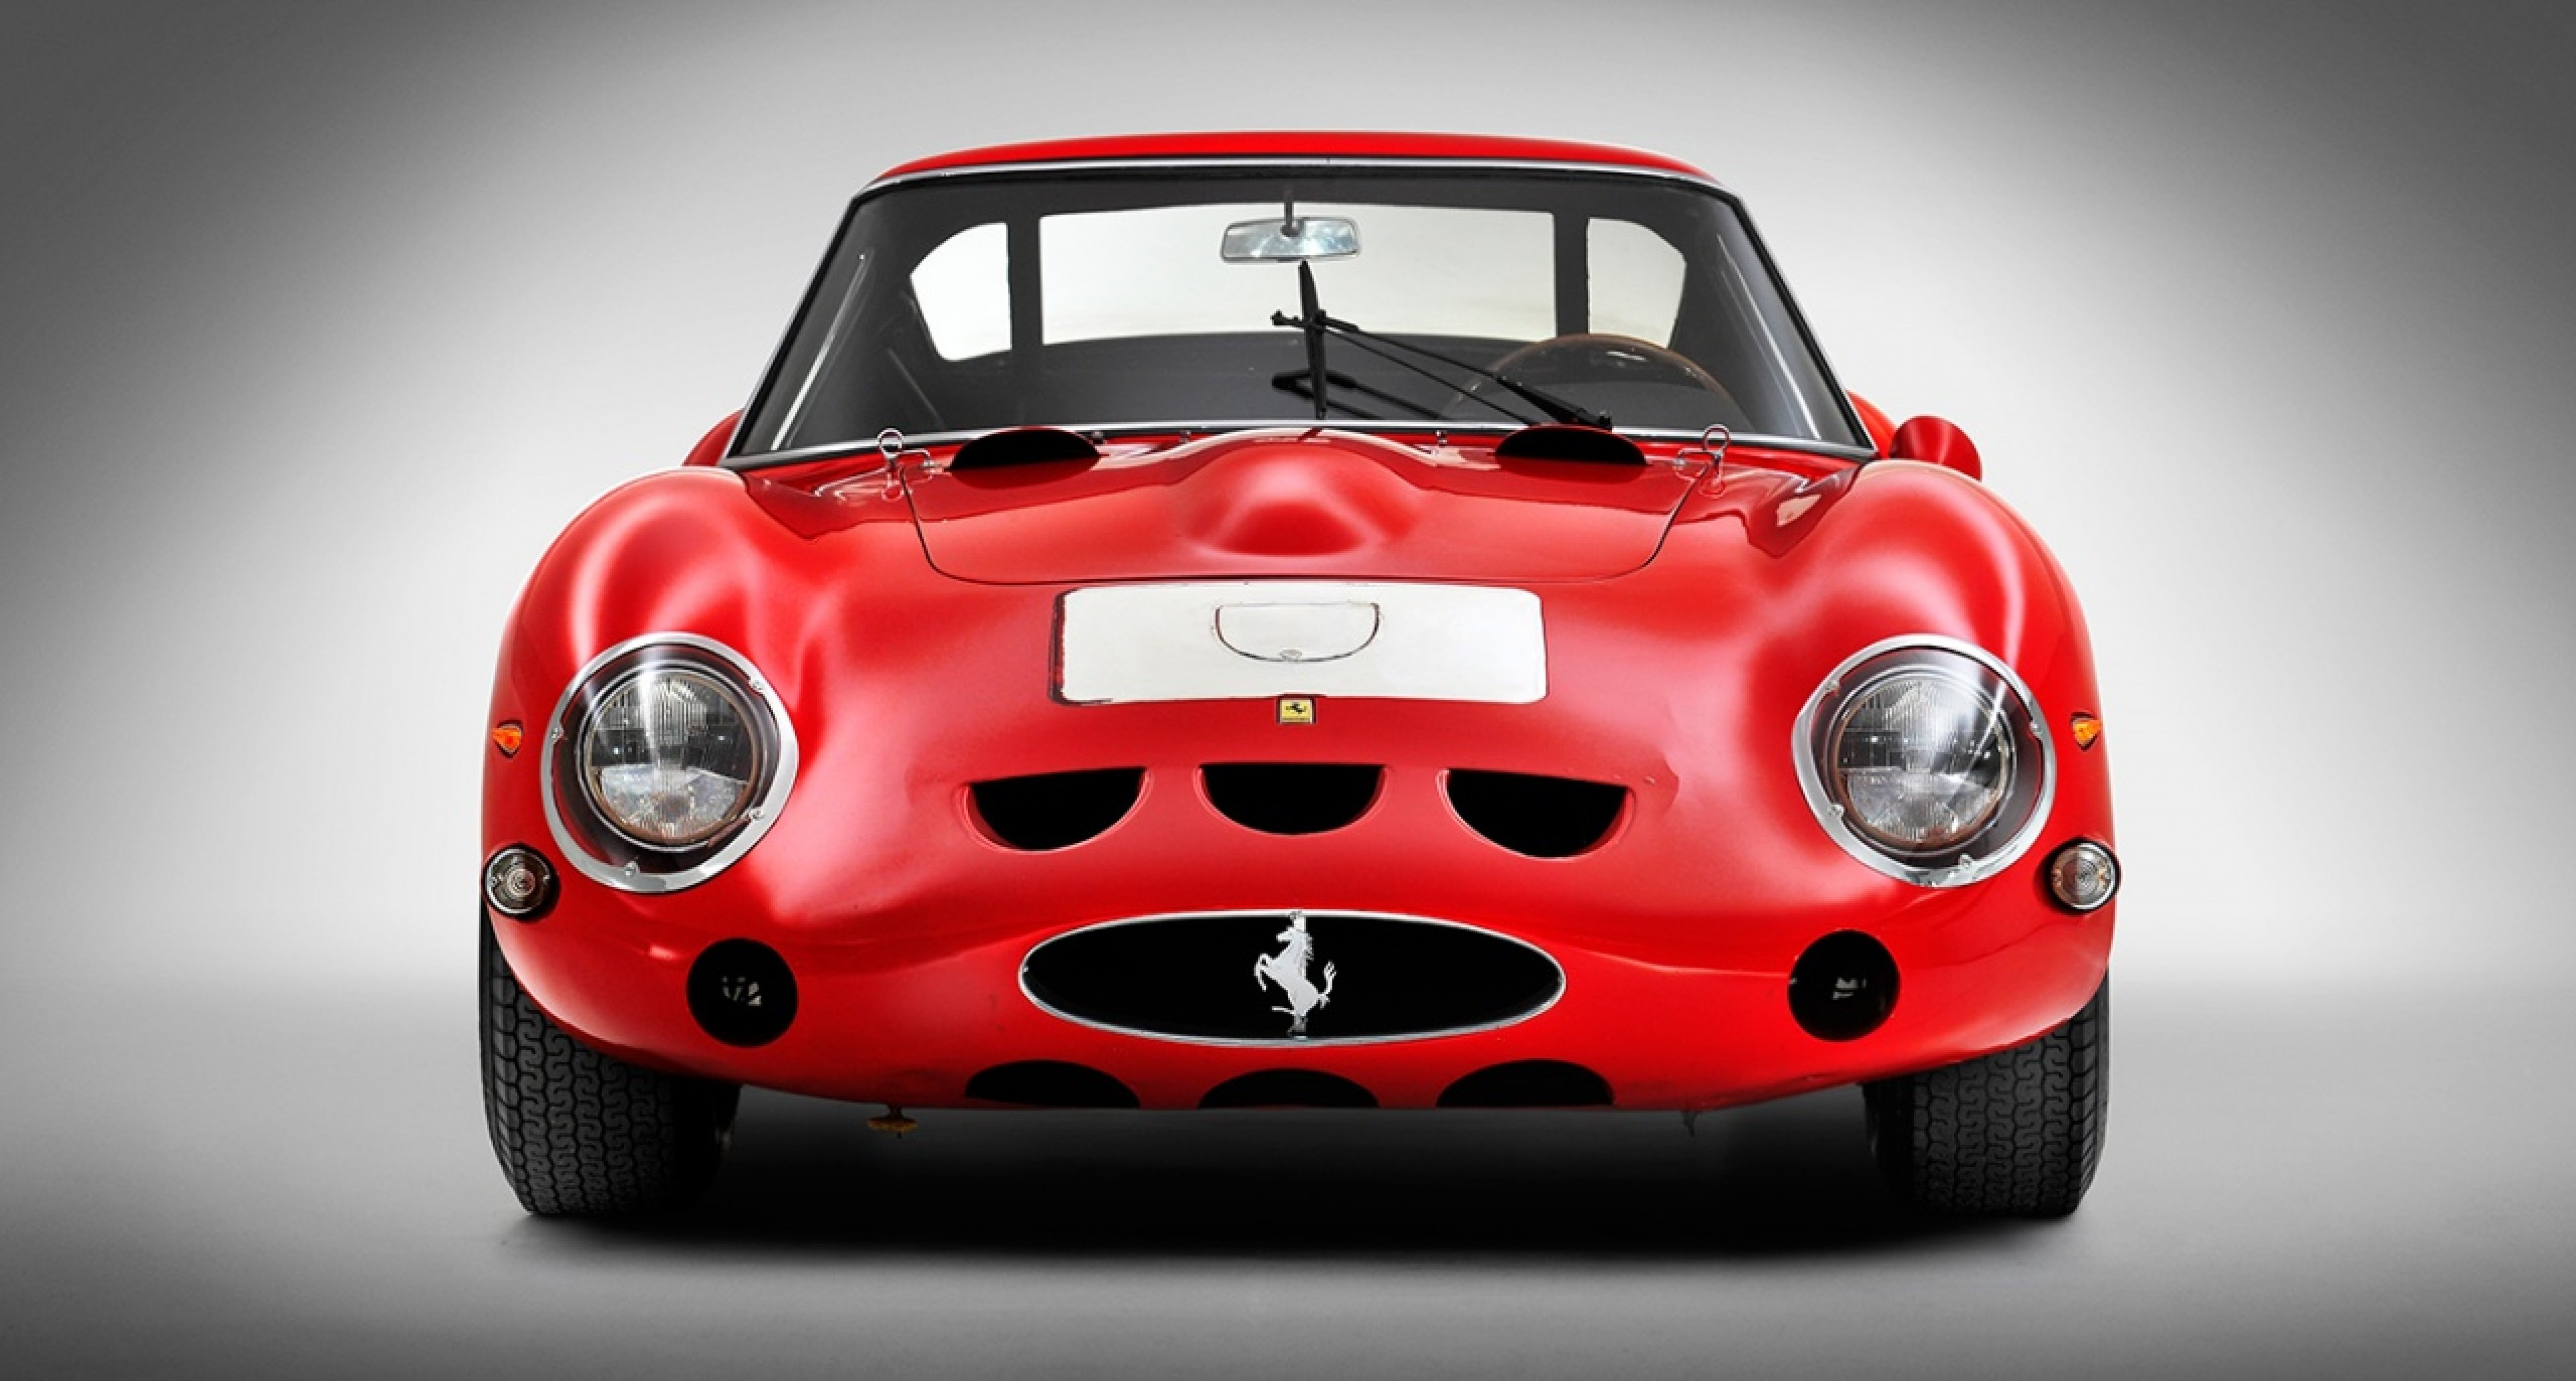 A 1962 Ferrari 250 GTO - more attractive than a piece of art?